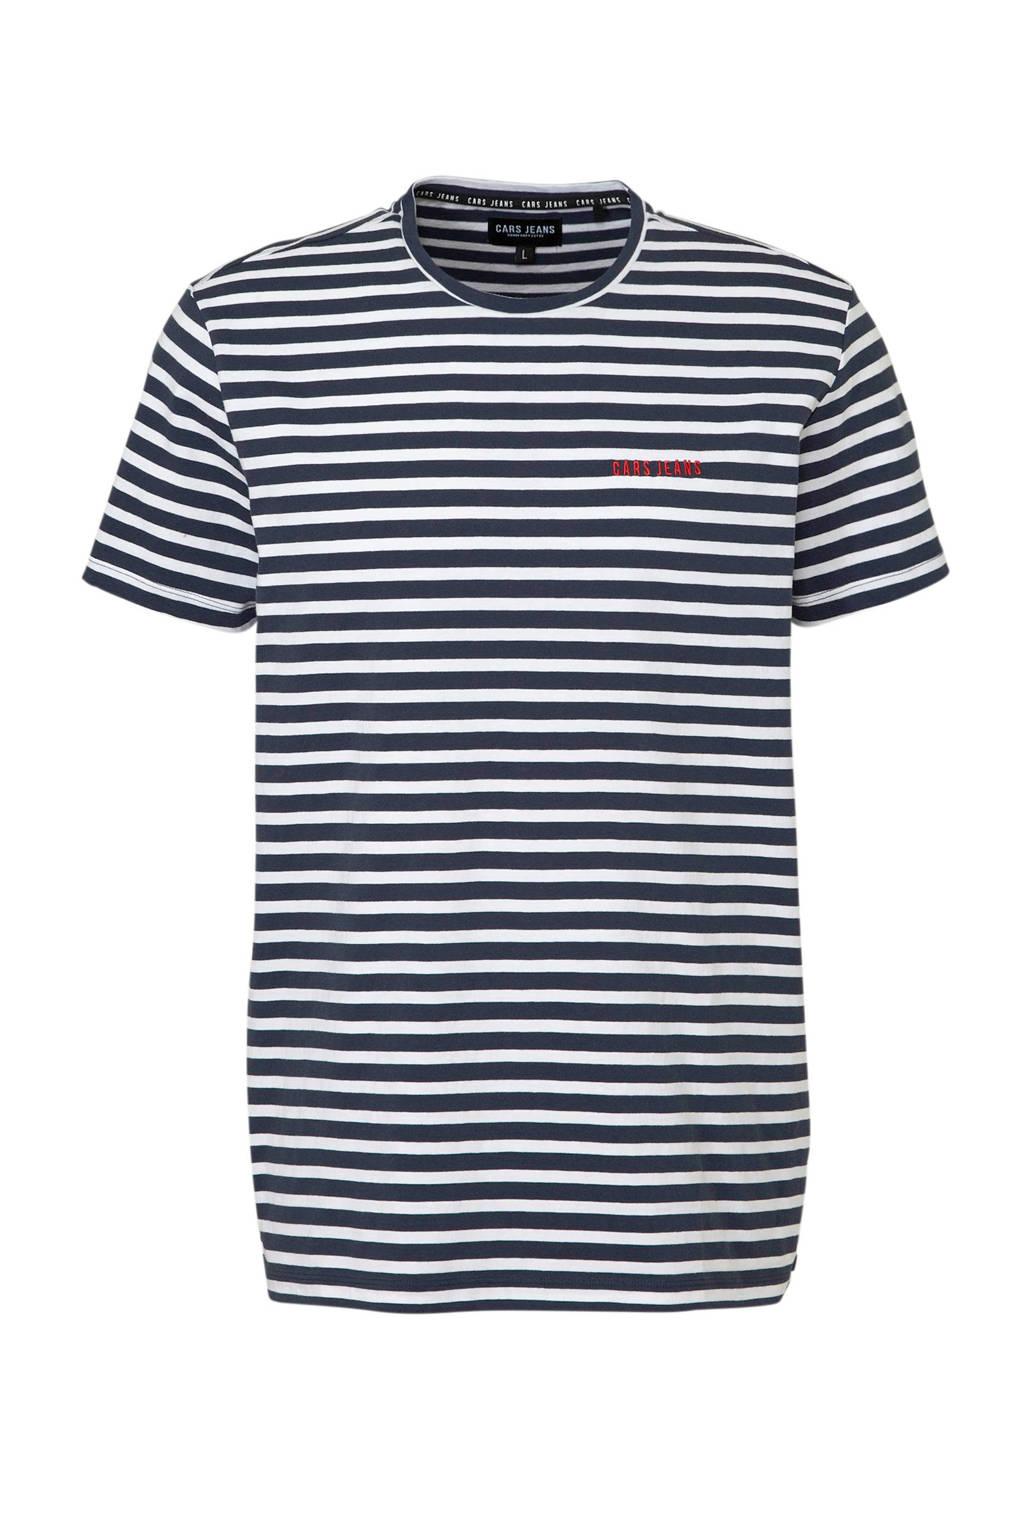 Cars T-shirt, Blaue=w/wit